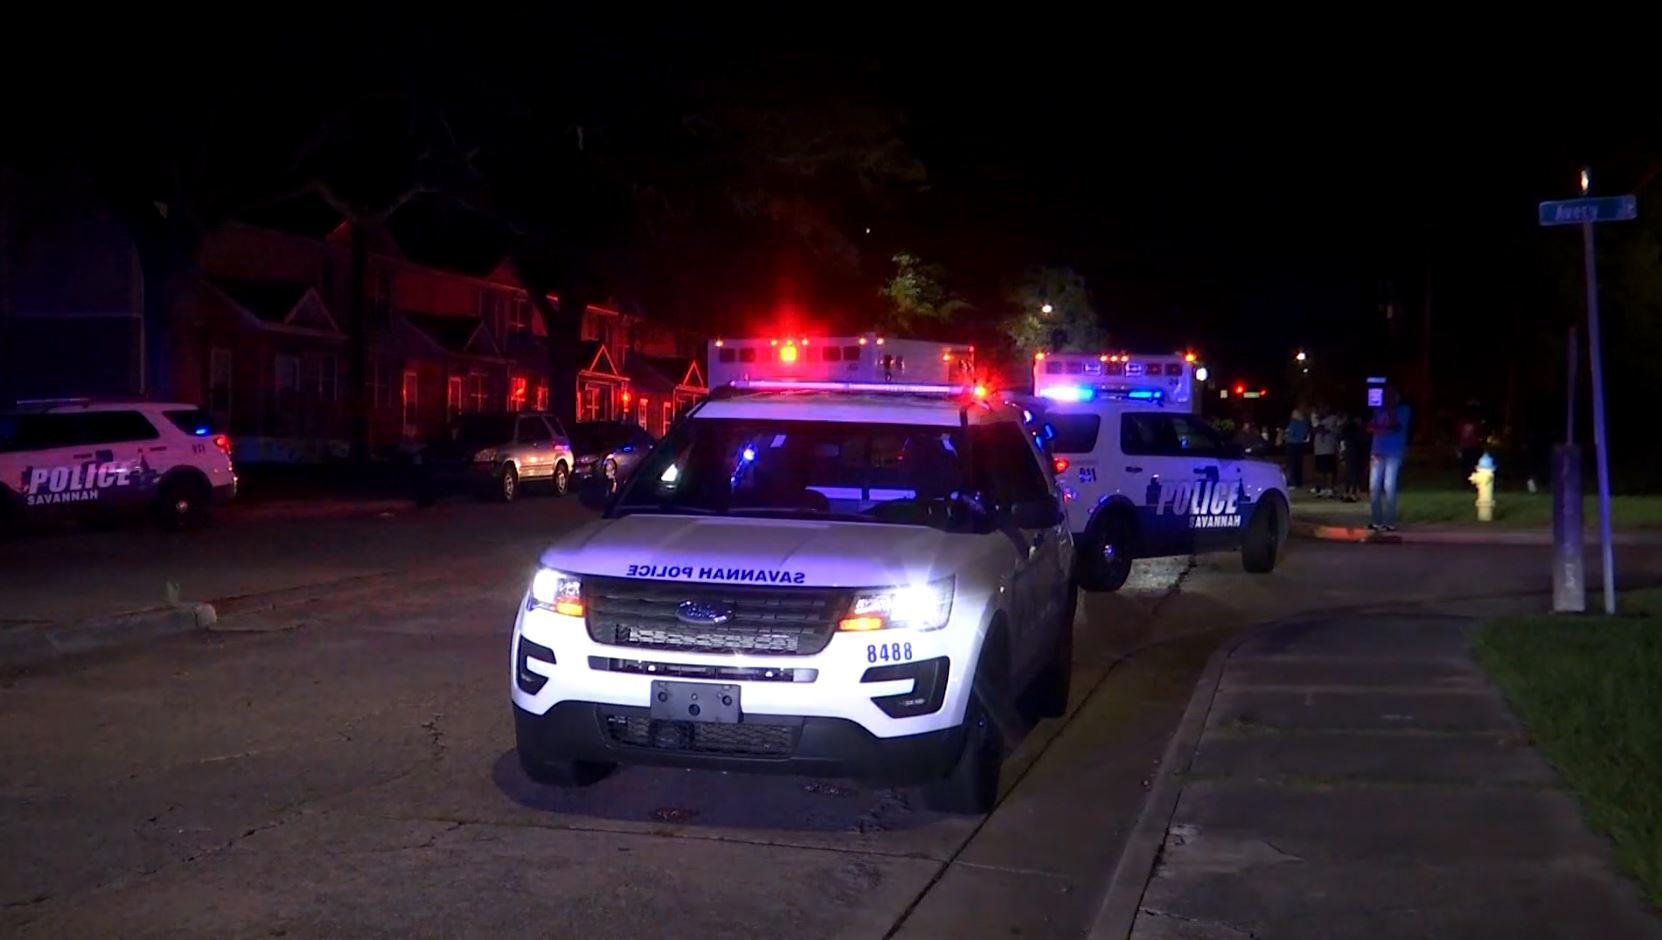 1 dead, 8 wounded in Savannah, Georgia, shooting